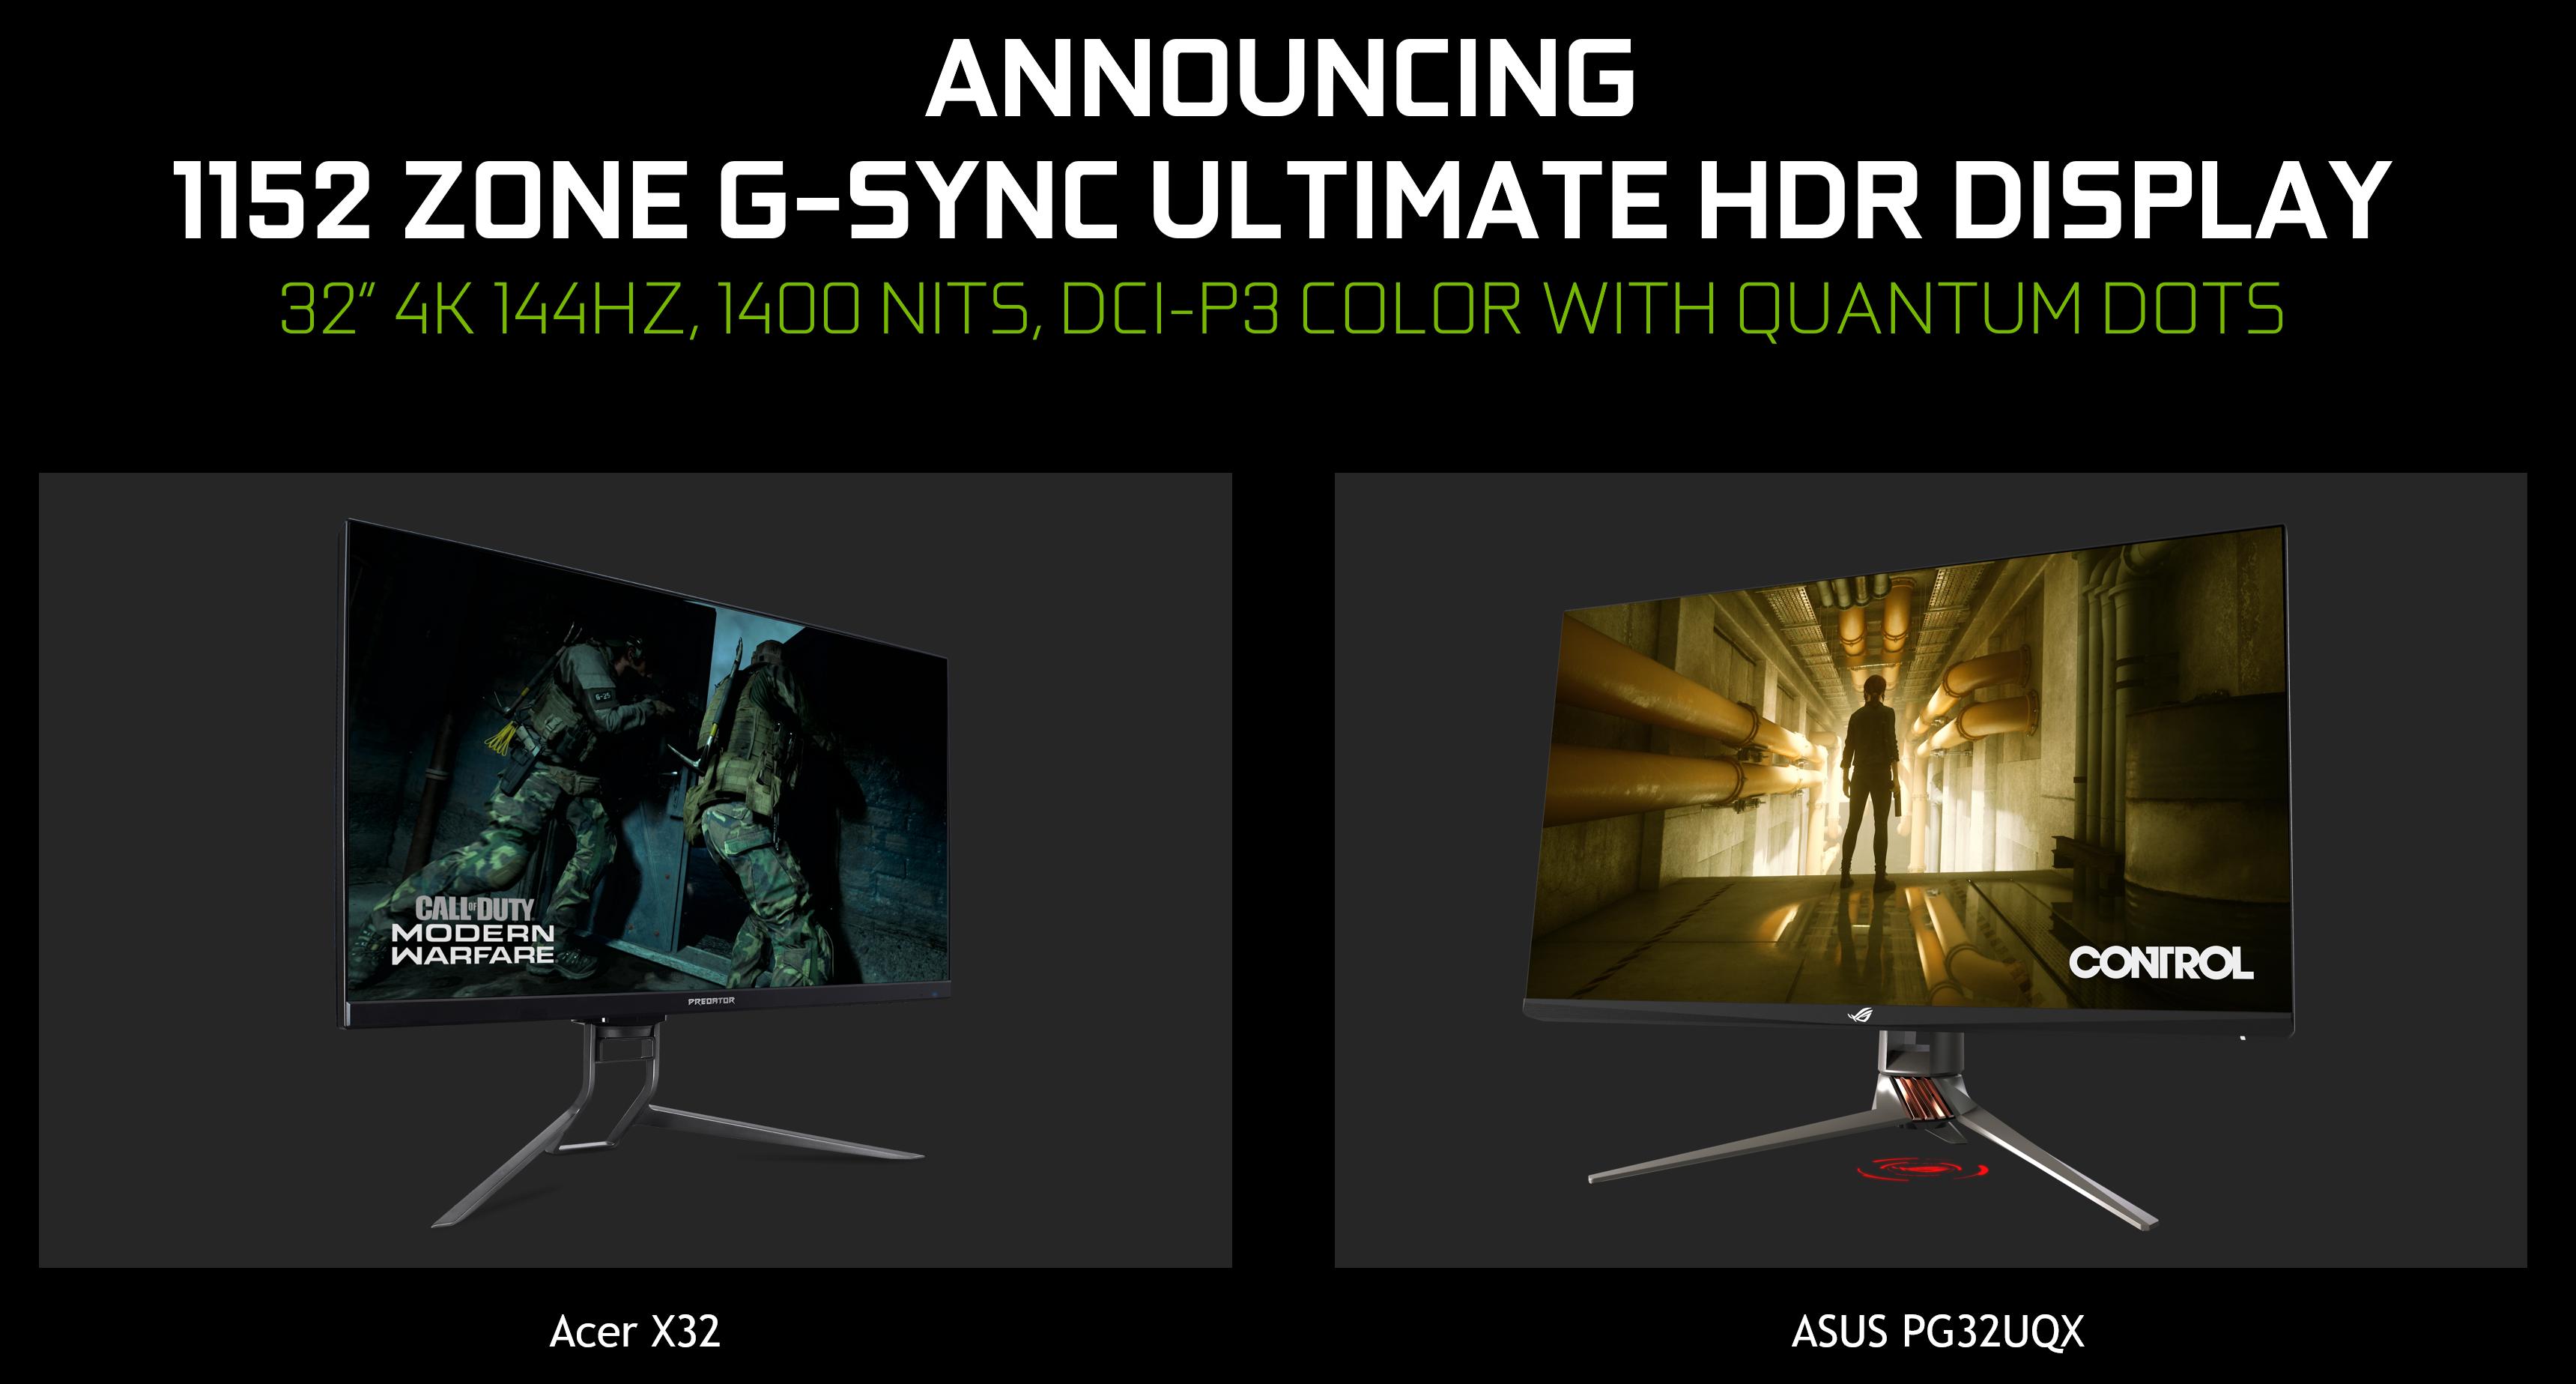 Acer X32 Mini-LED G-SYNC Ultimate and ASUS PH32UQX monitors